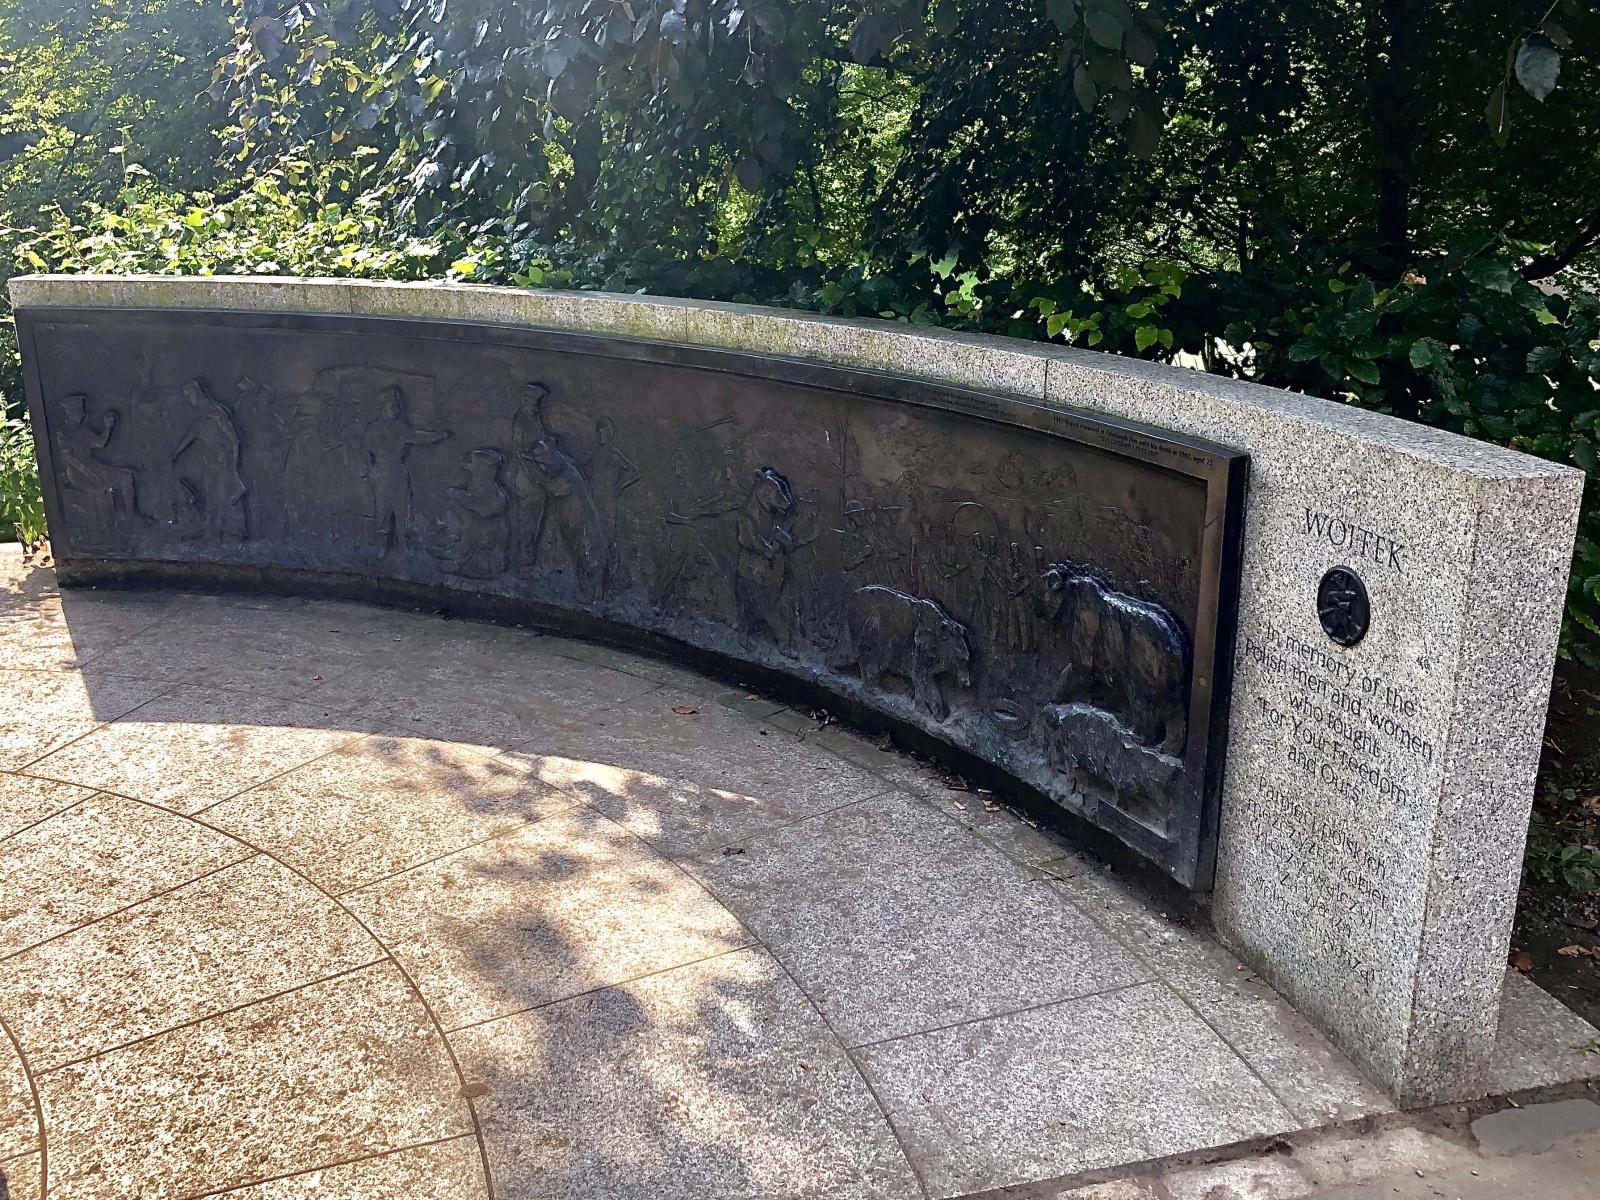 Wojtek The Soldier Bear Memorial